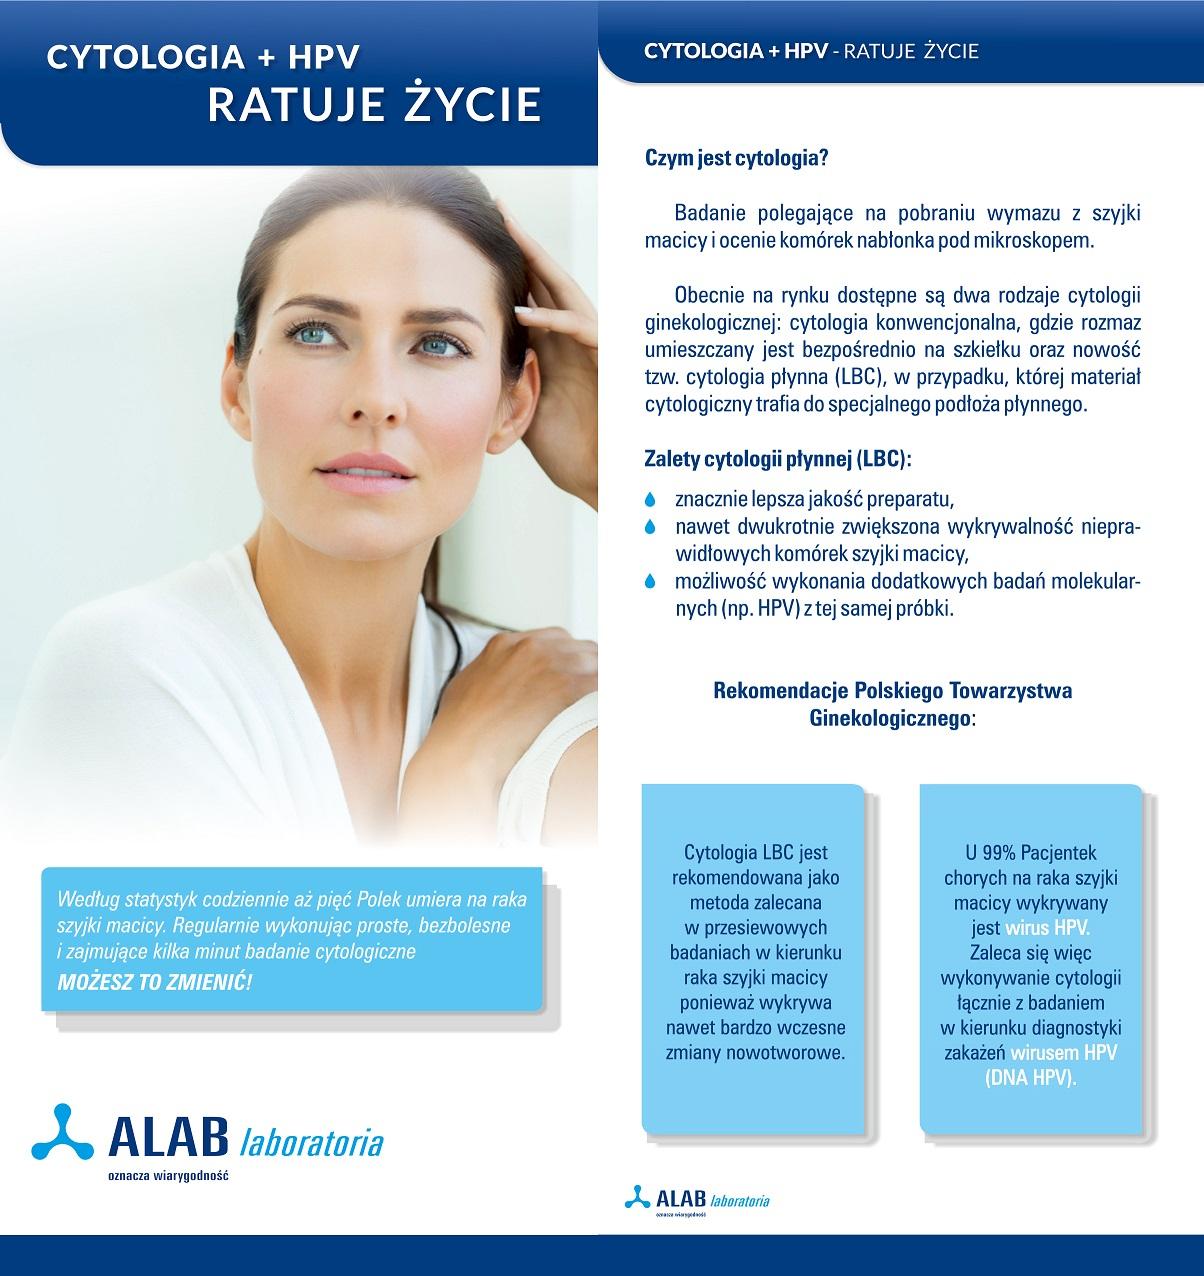 ulotka cytologia HPV_alab laboratoria